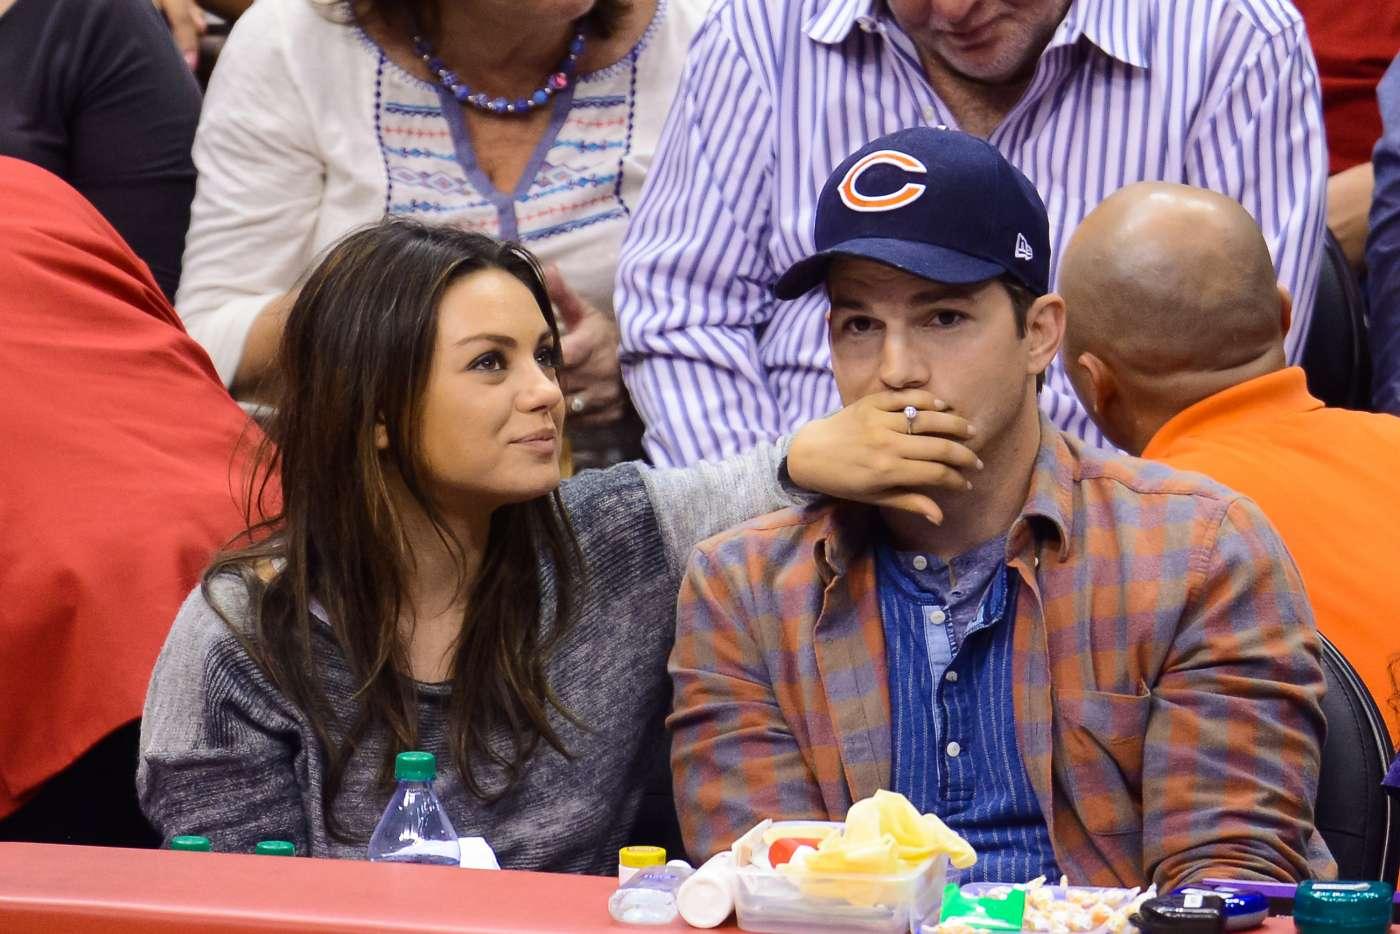 Mila Kunis And Ashton Kutcher Got Their Wedding Rings From Etsy